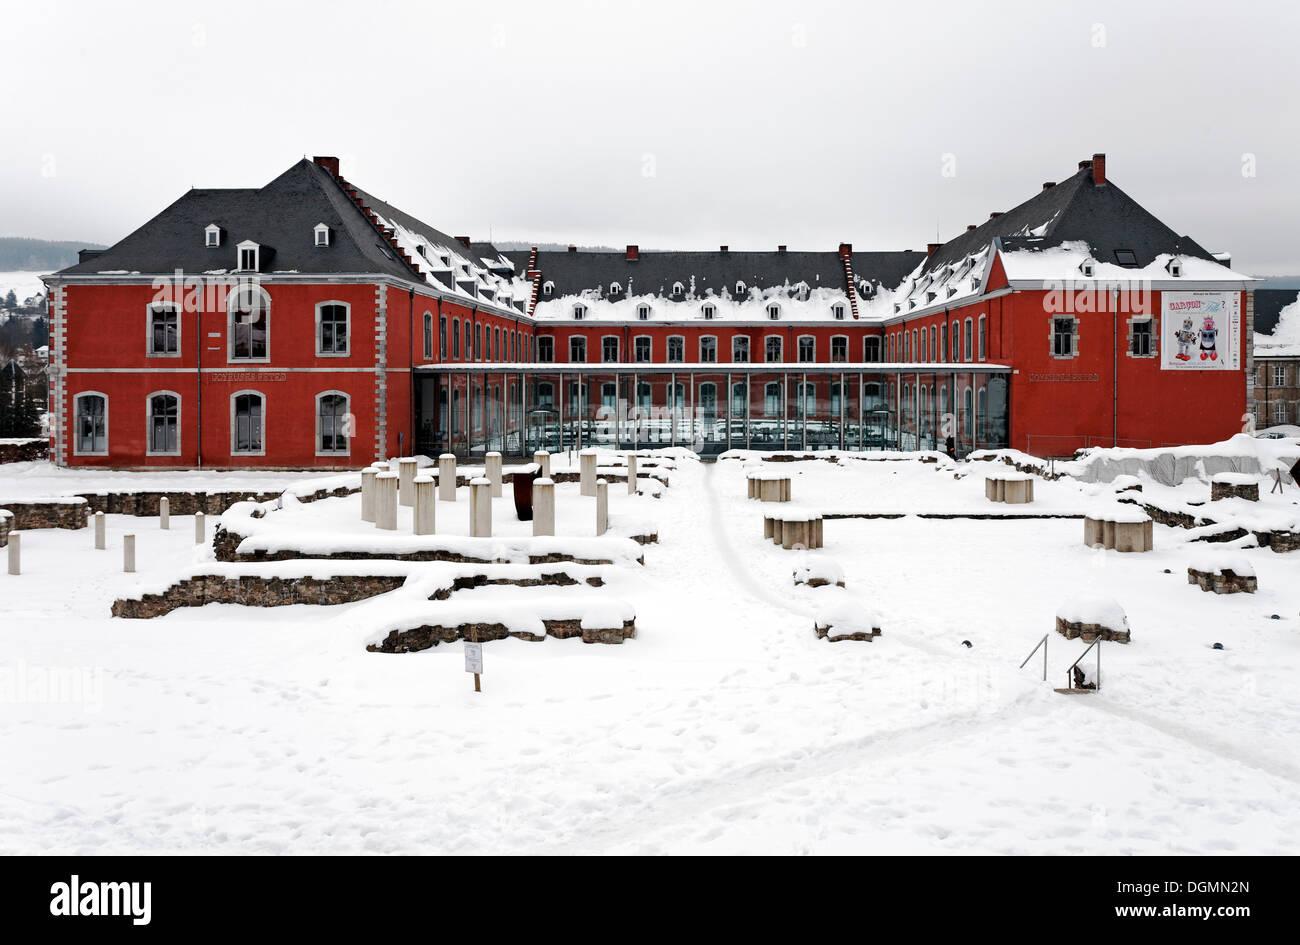 Stavelot Abbey, Ardennes region, Liège province, Wallonia region, Belgium, Benelux, Europe - Stock Image